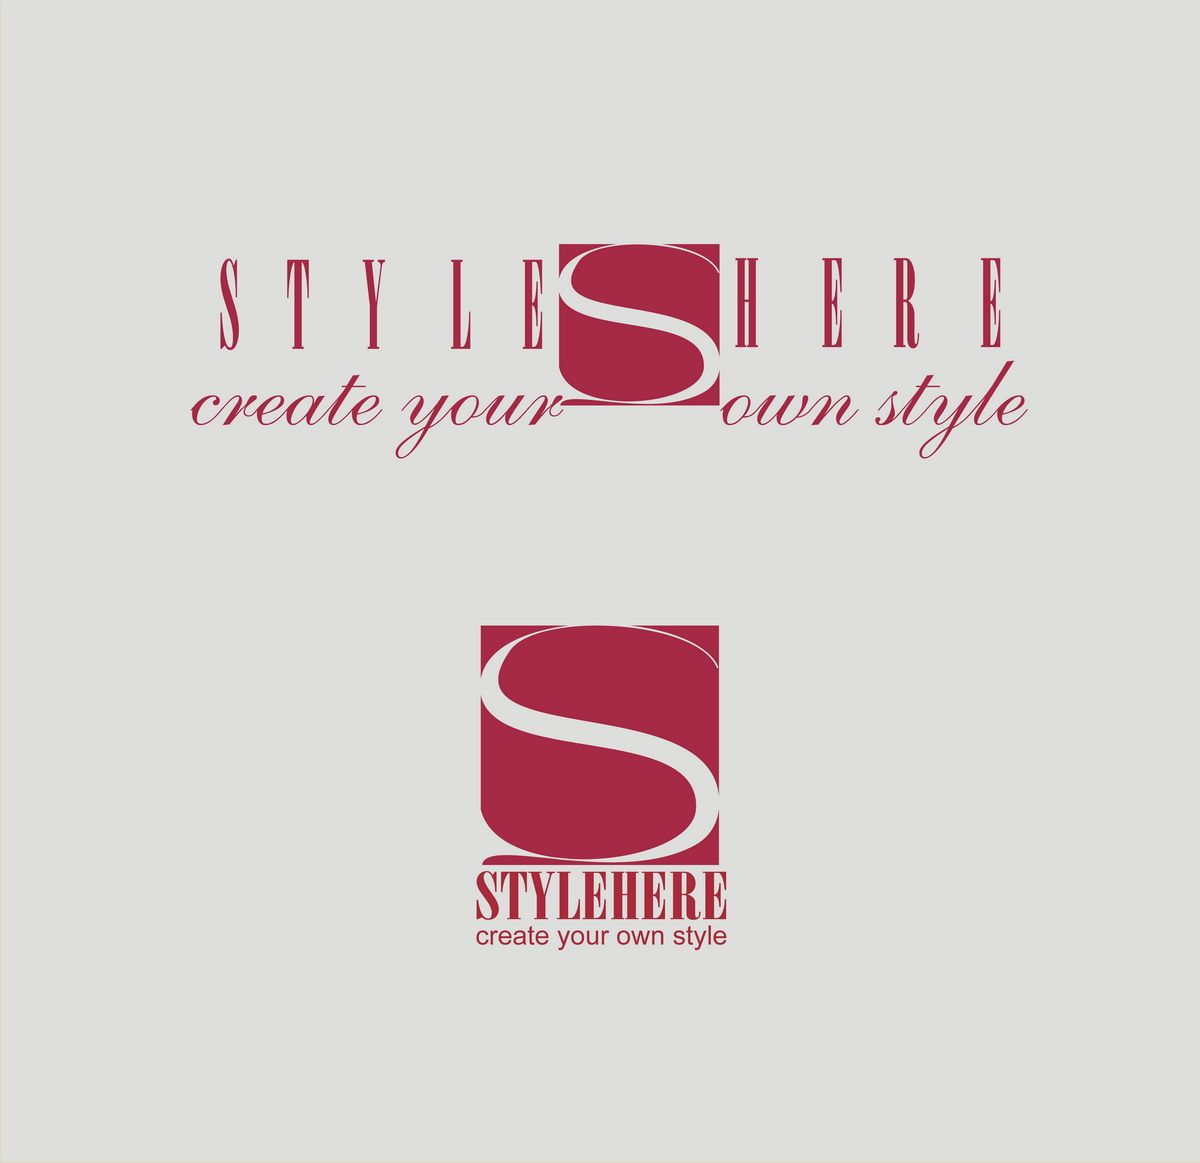 Логотип для интернет-магазина stylehere.ru - дизайнер oformitelblok